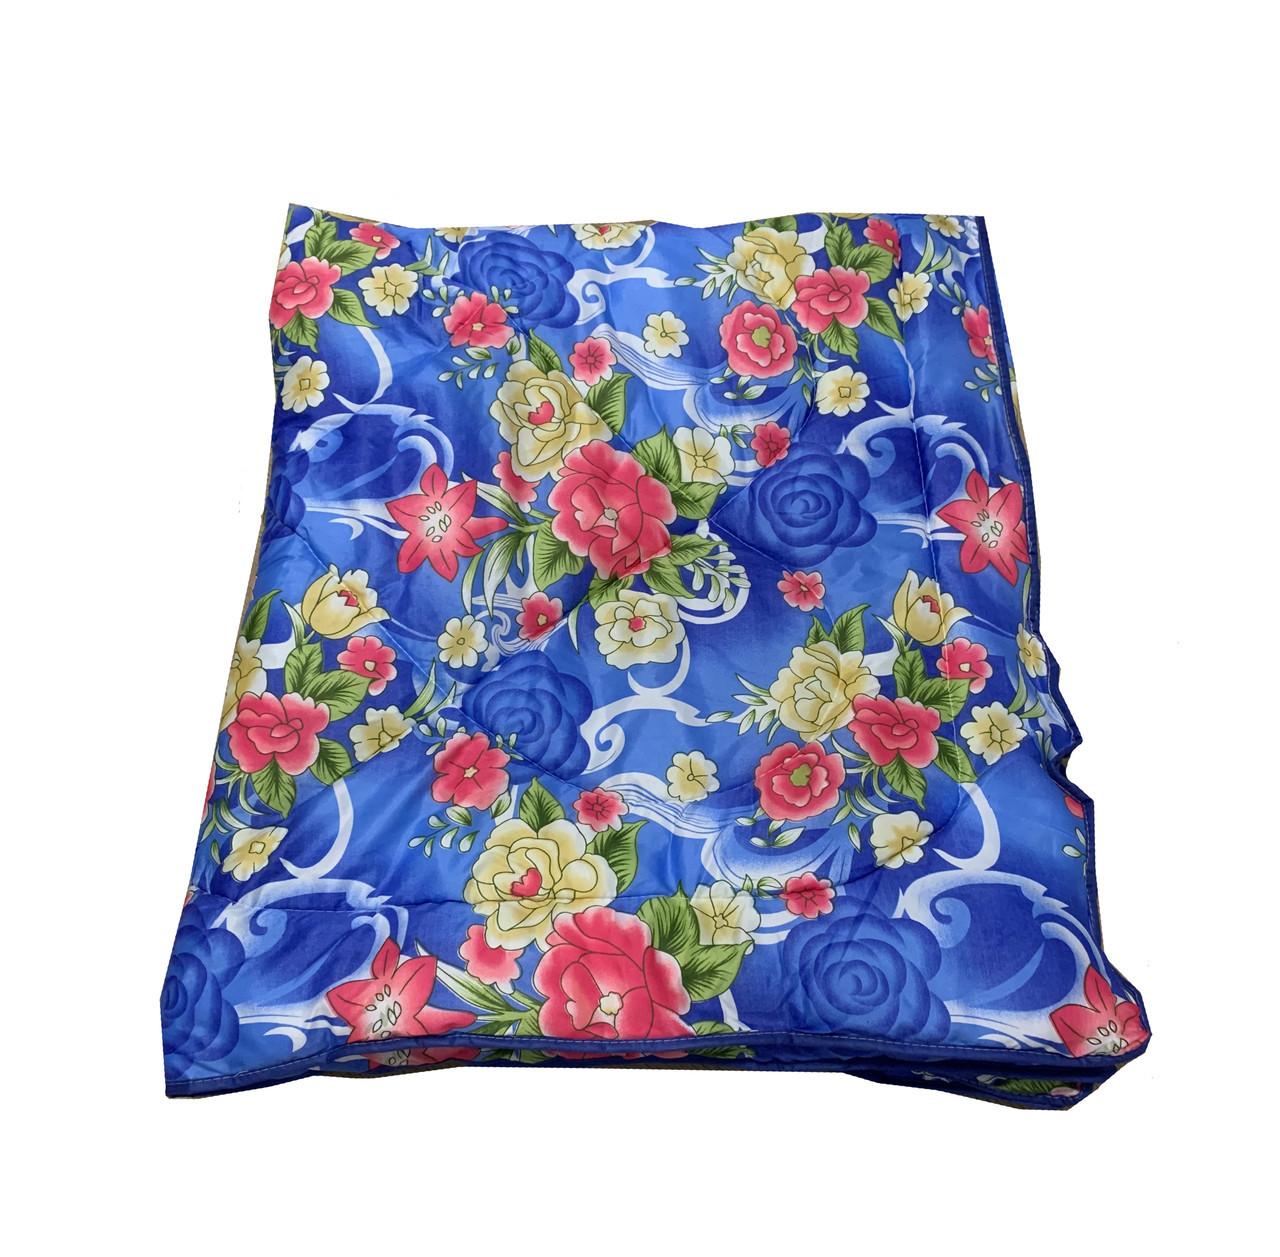 Одеяло синее двуспальное, холлофайбер 180*220 см, Украина